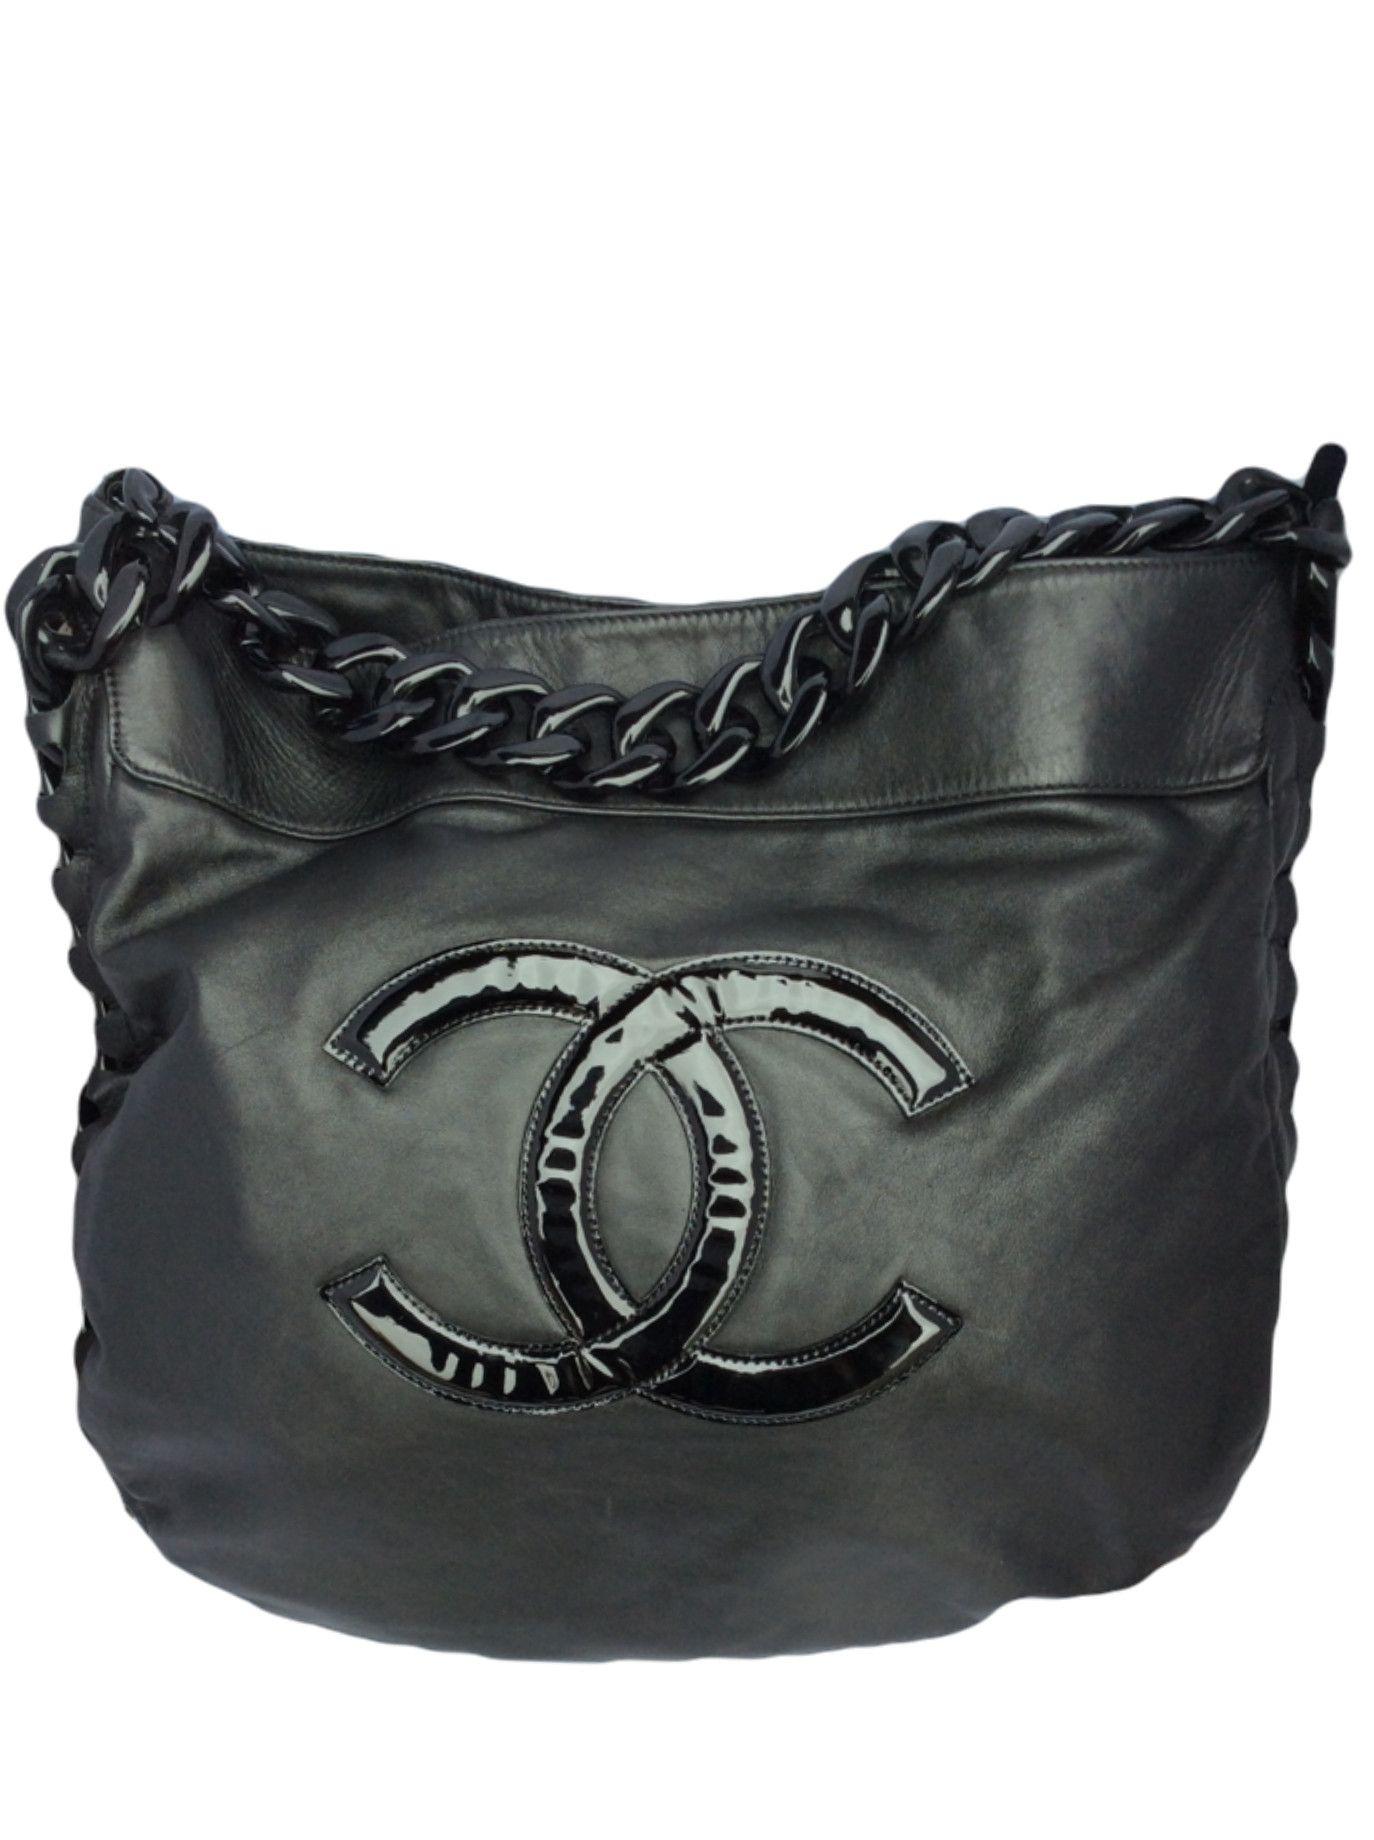 The dress agency - Chanel Jumbo Black Hobo Bag With Plastic Chain Handle Timpanys Dress Agency